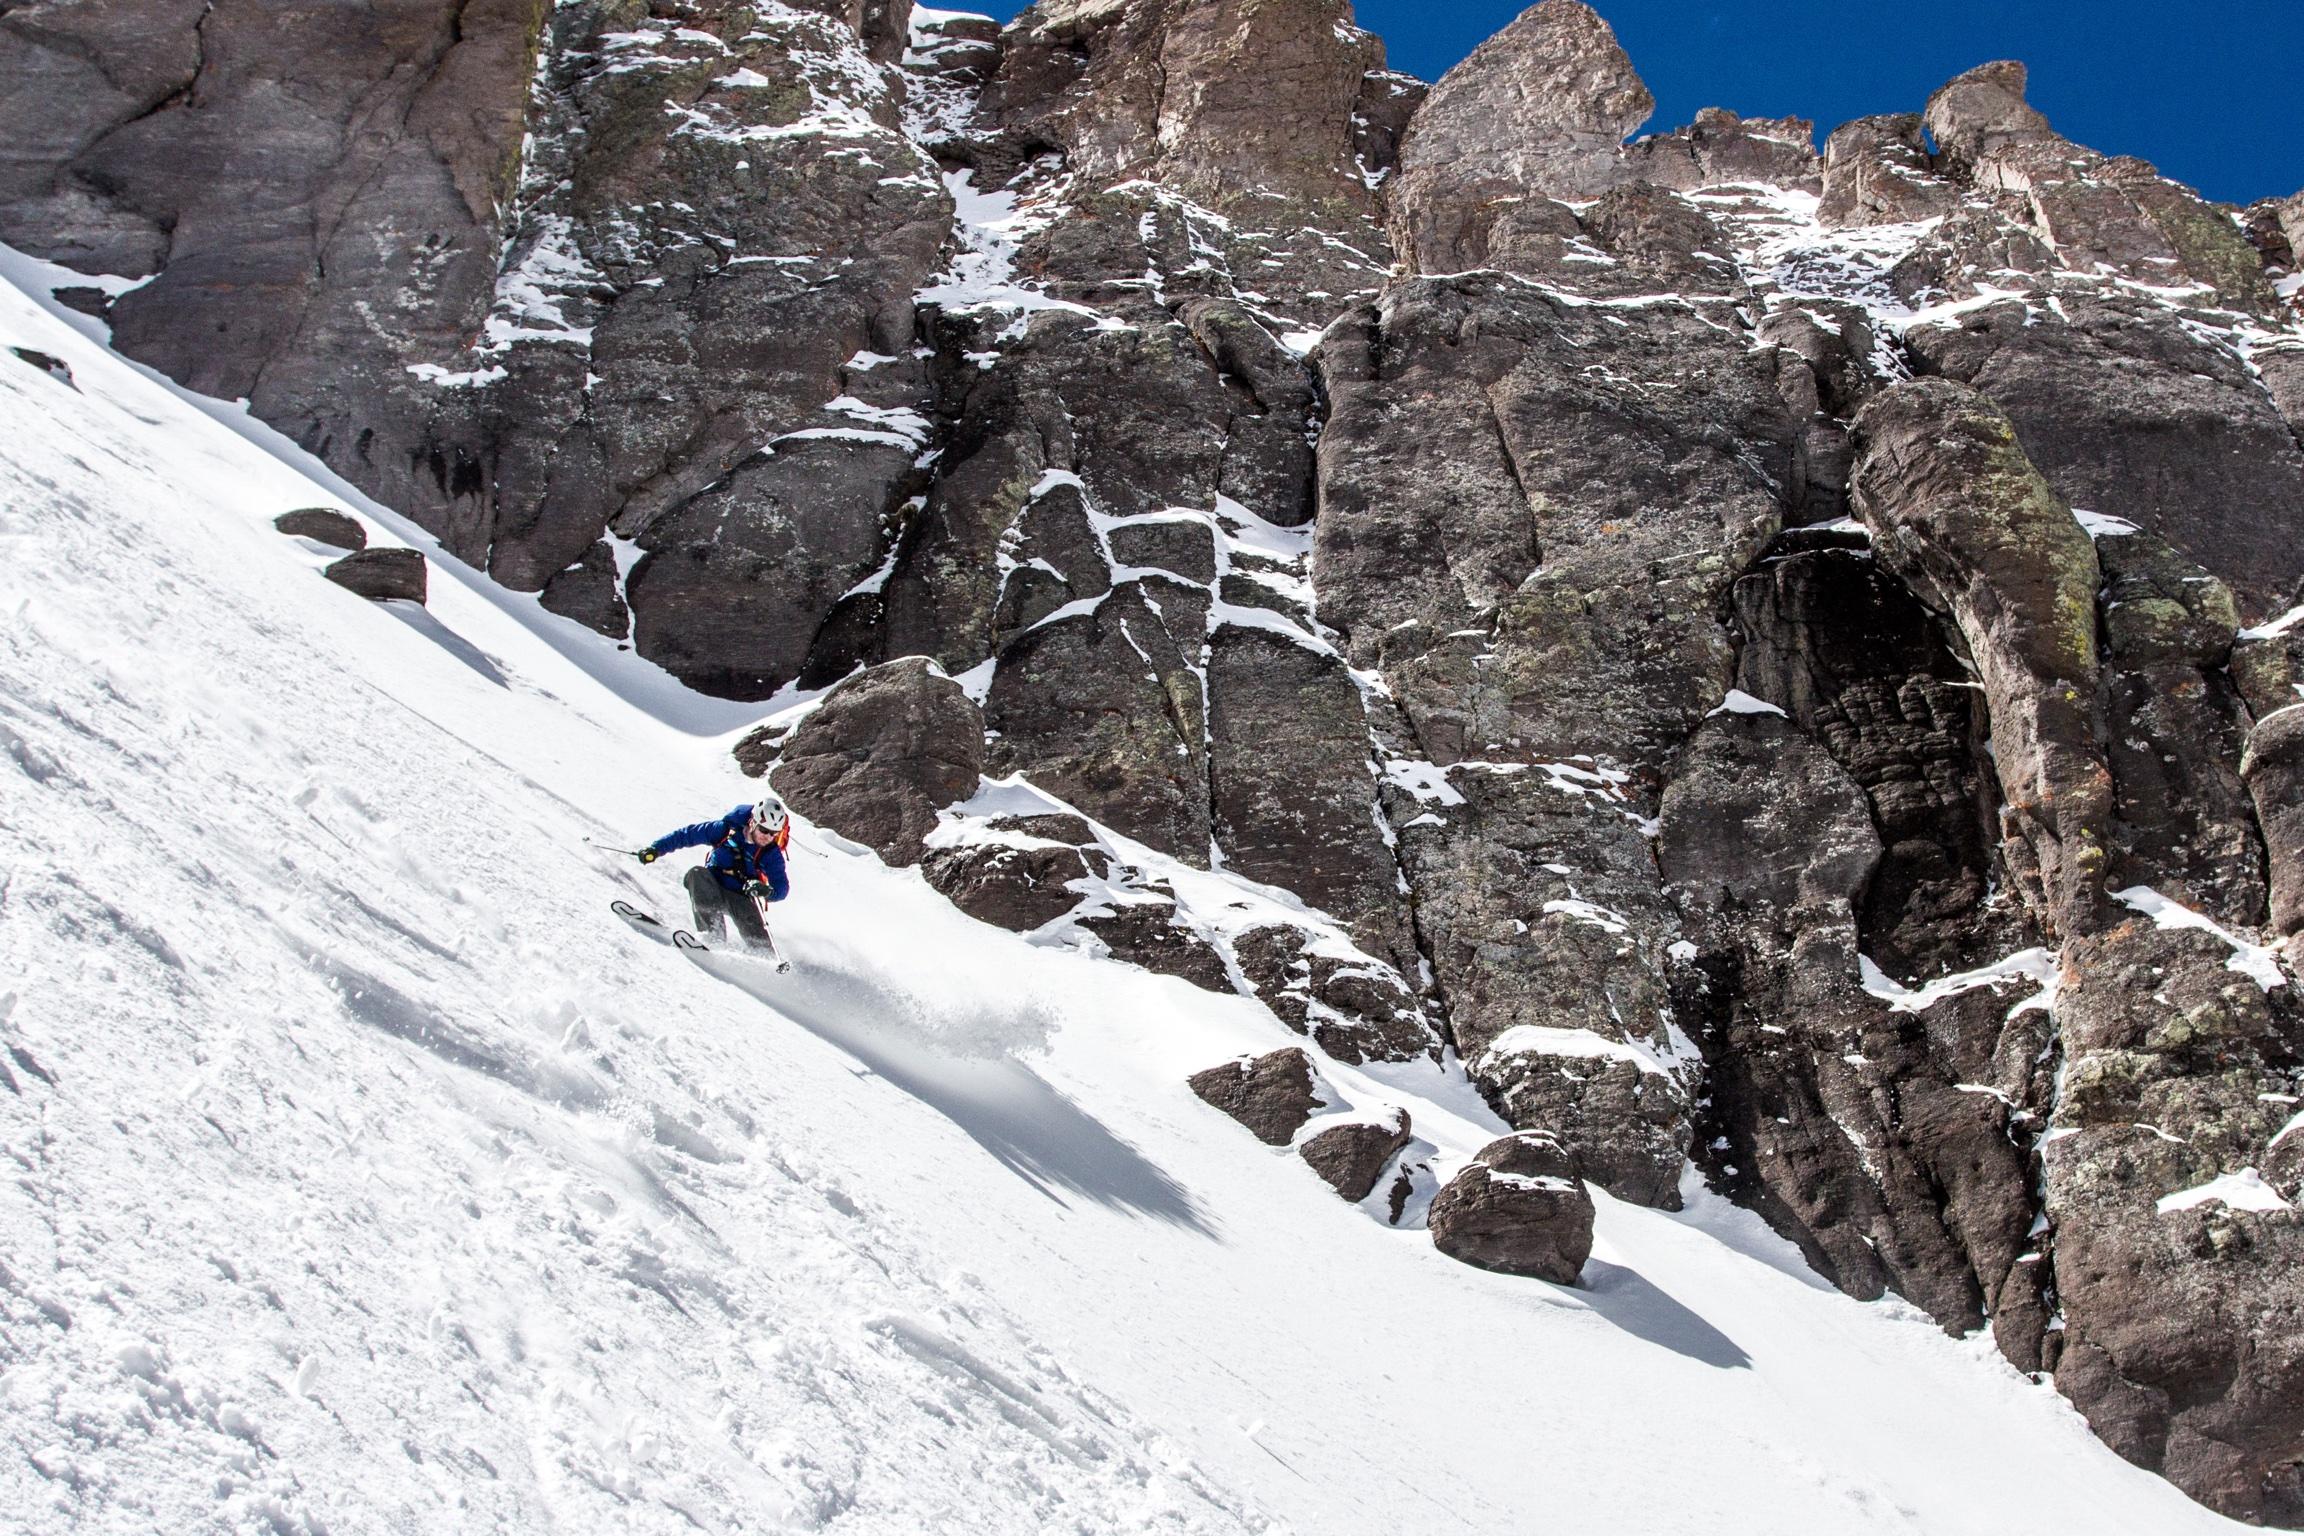 Dropping into the North Couloir of Potosi Peak. Skier: Jon Jay. Photo: TJ David